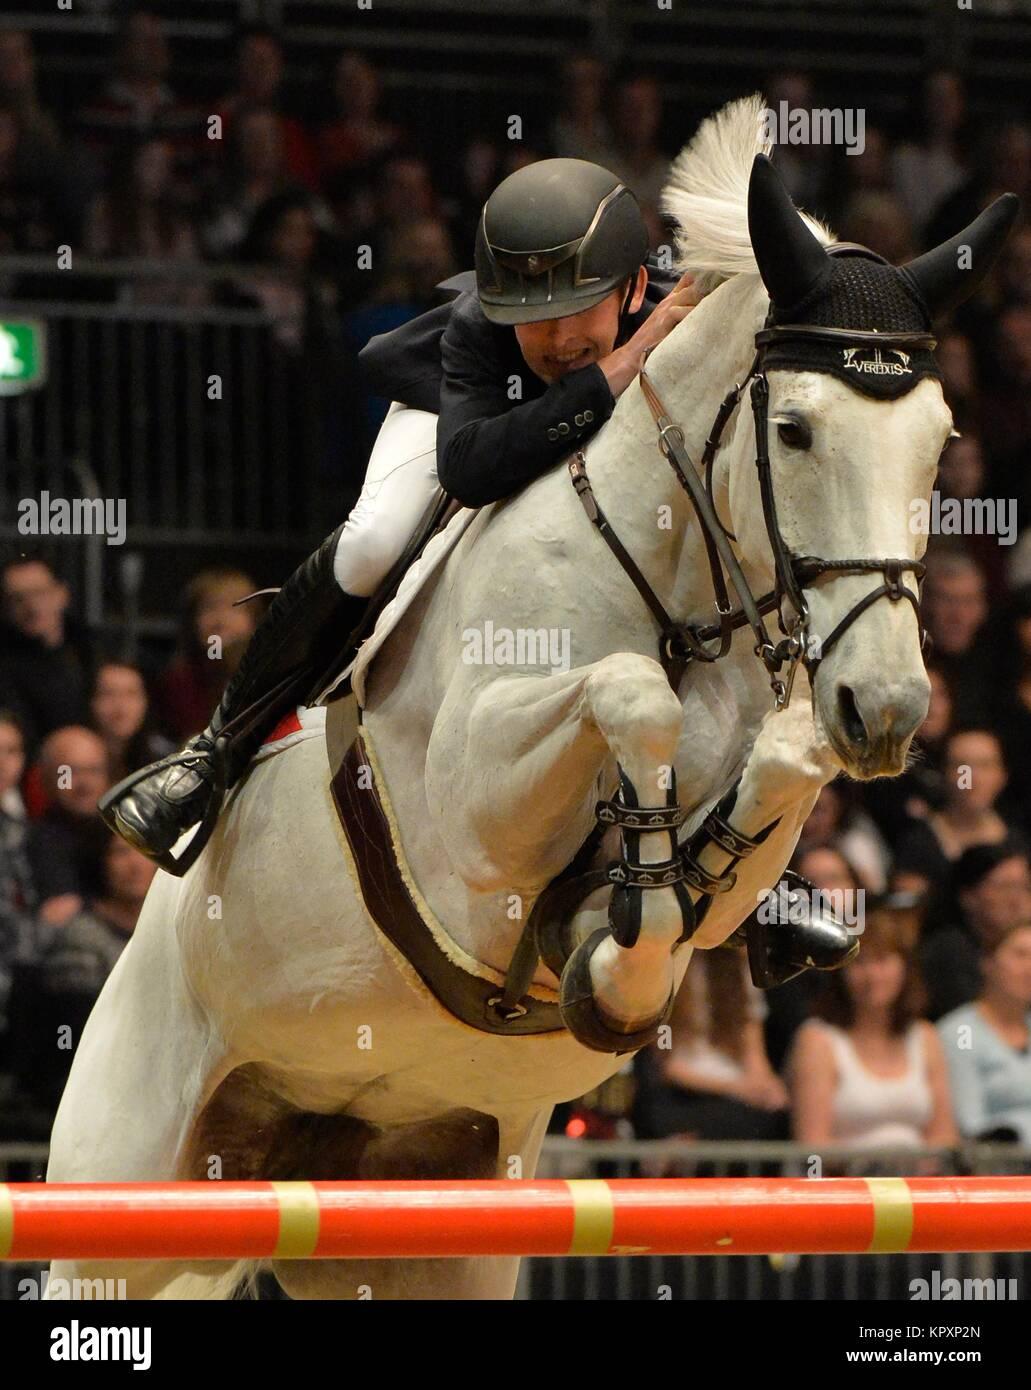 London, UK. 17th Dec, 2017.  London Olympia International Horse Show The Longines FEI World Cup London Bertram Allen Stock Photo